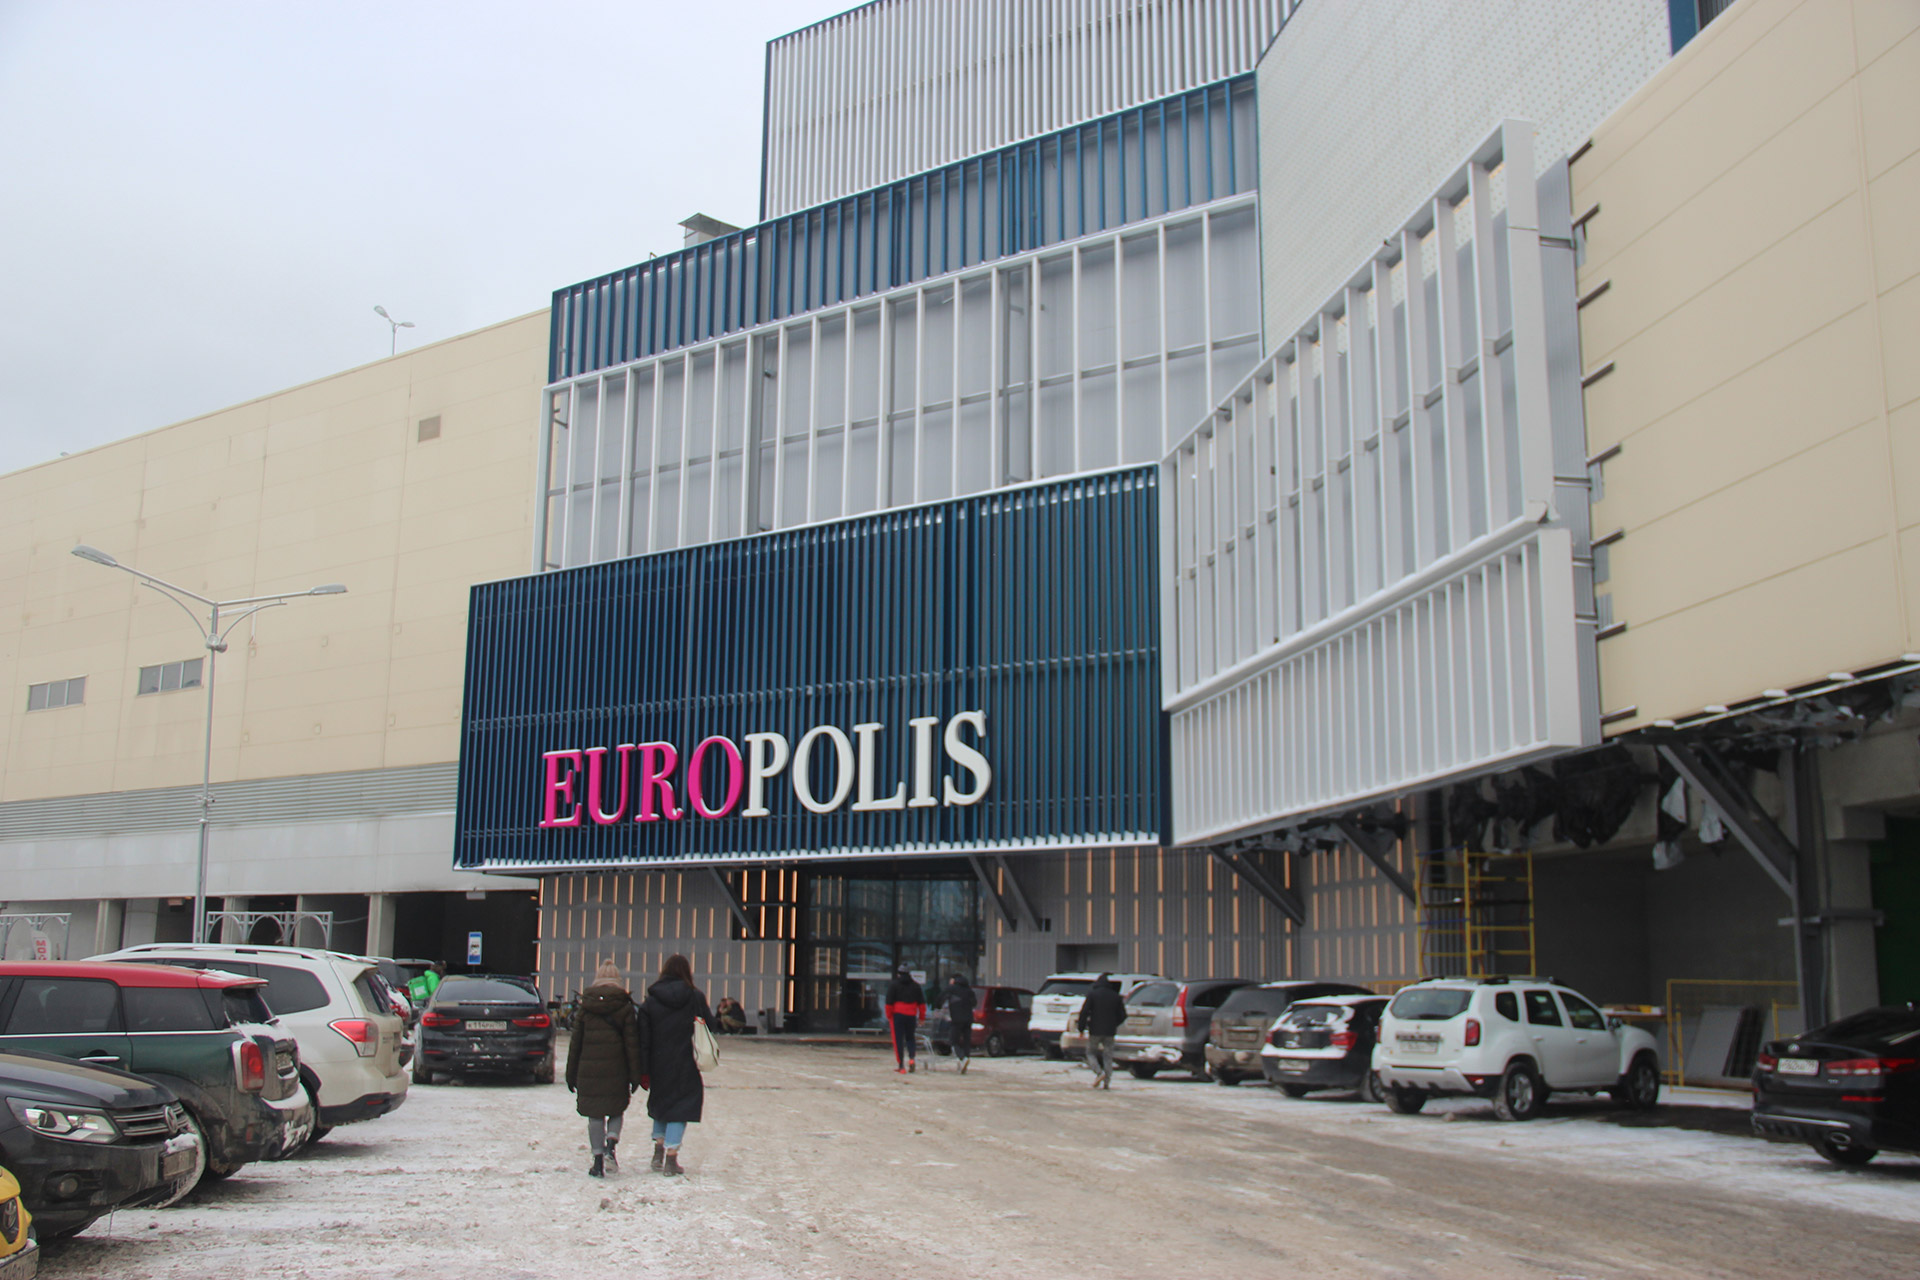 ТРЦ Европолис